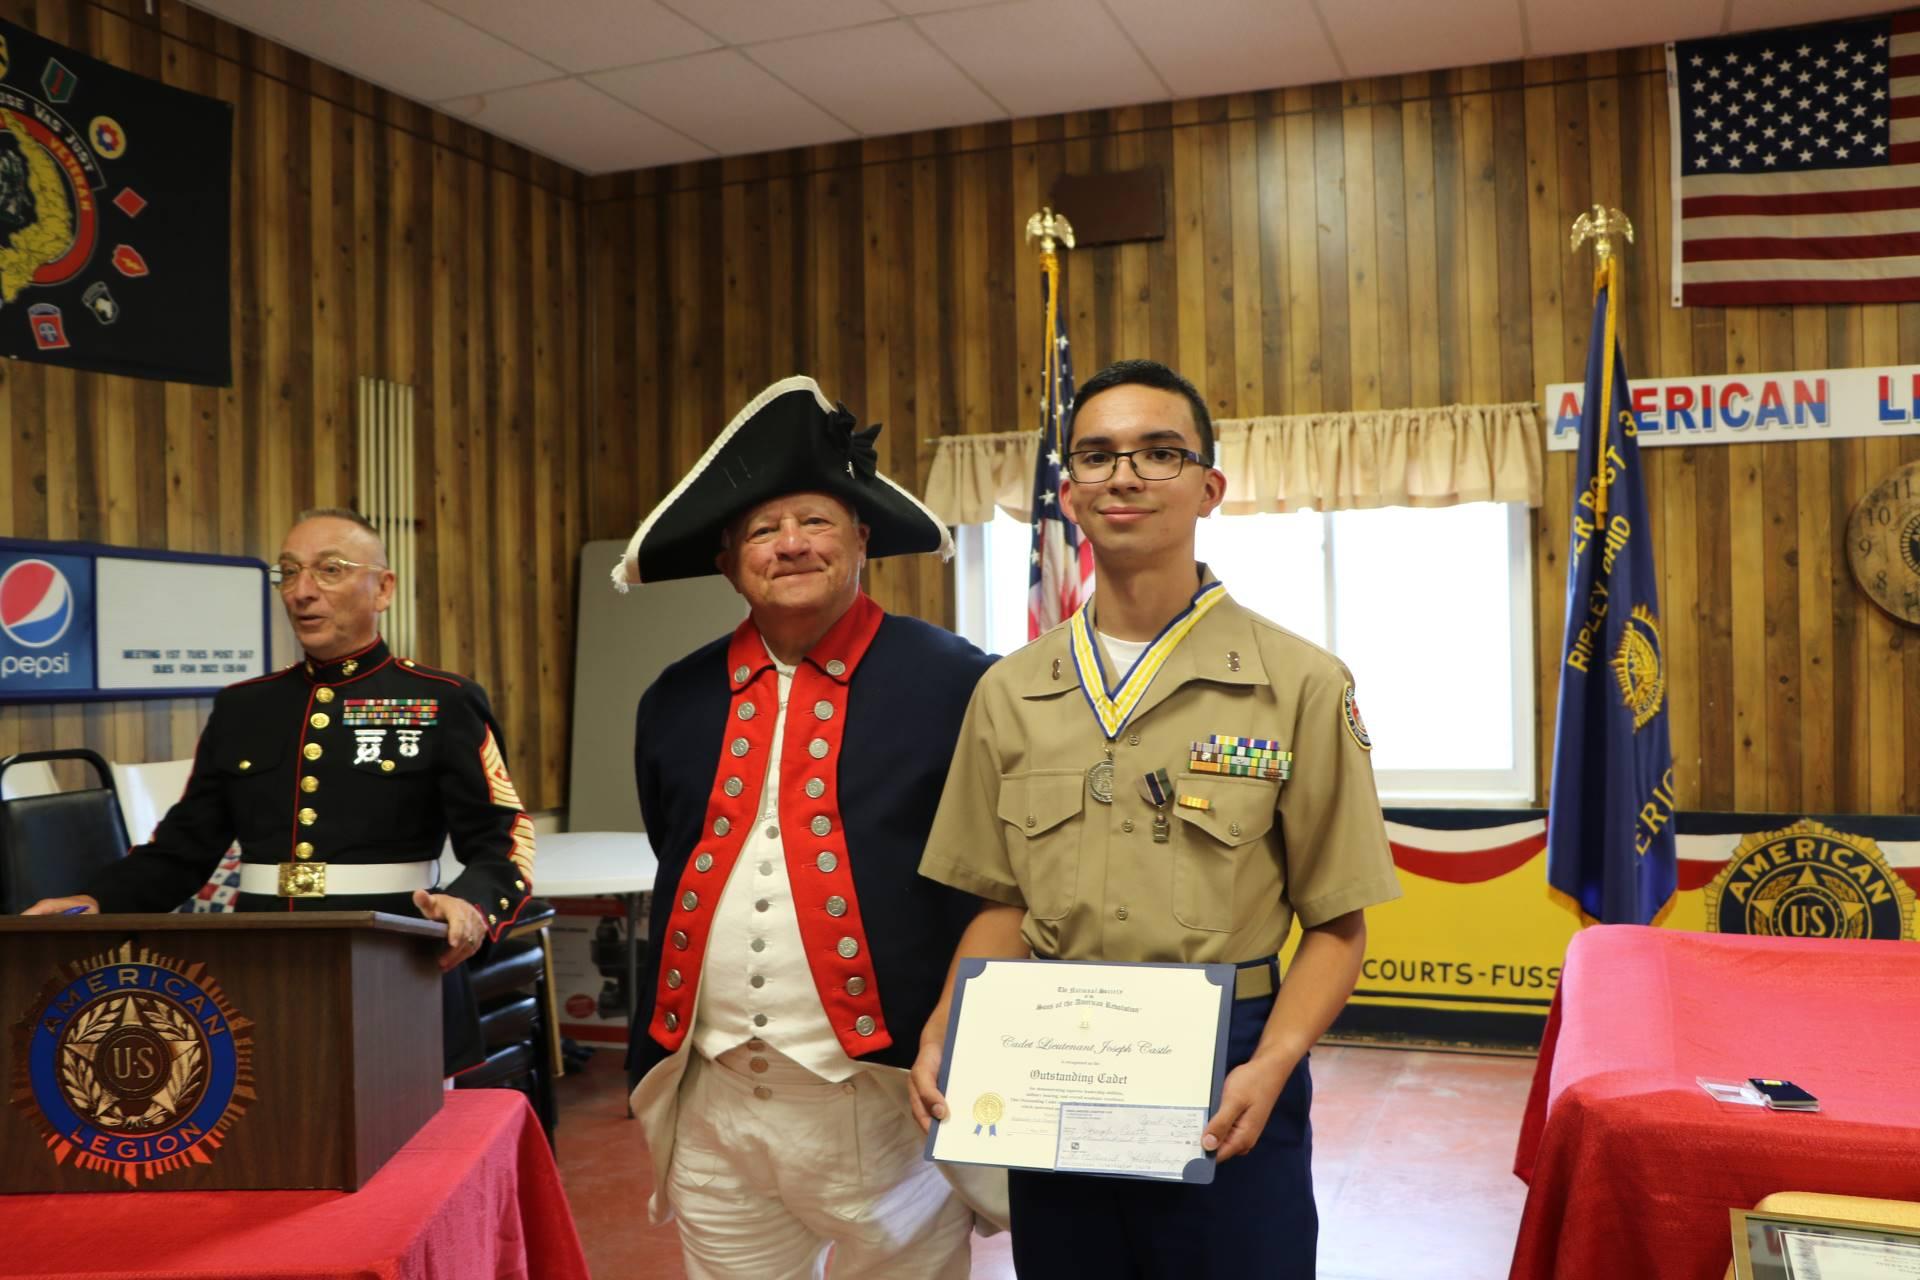 Cadet Joseph Castle receives the Sons of the American Revolution Enhanced Program Award